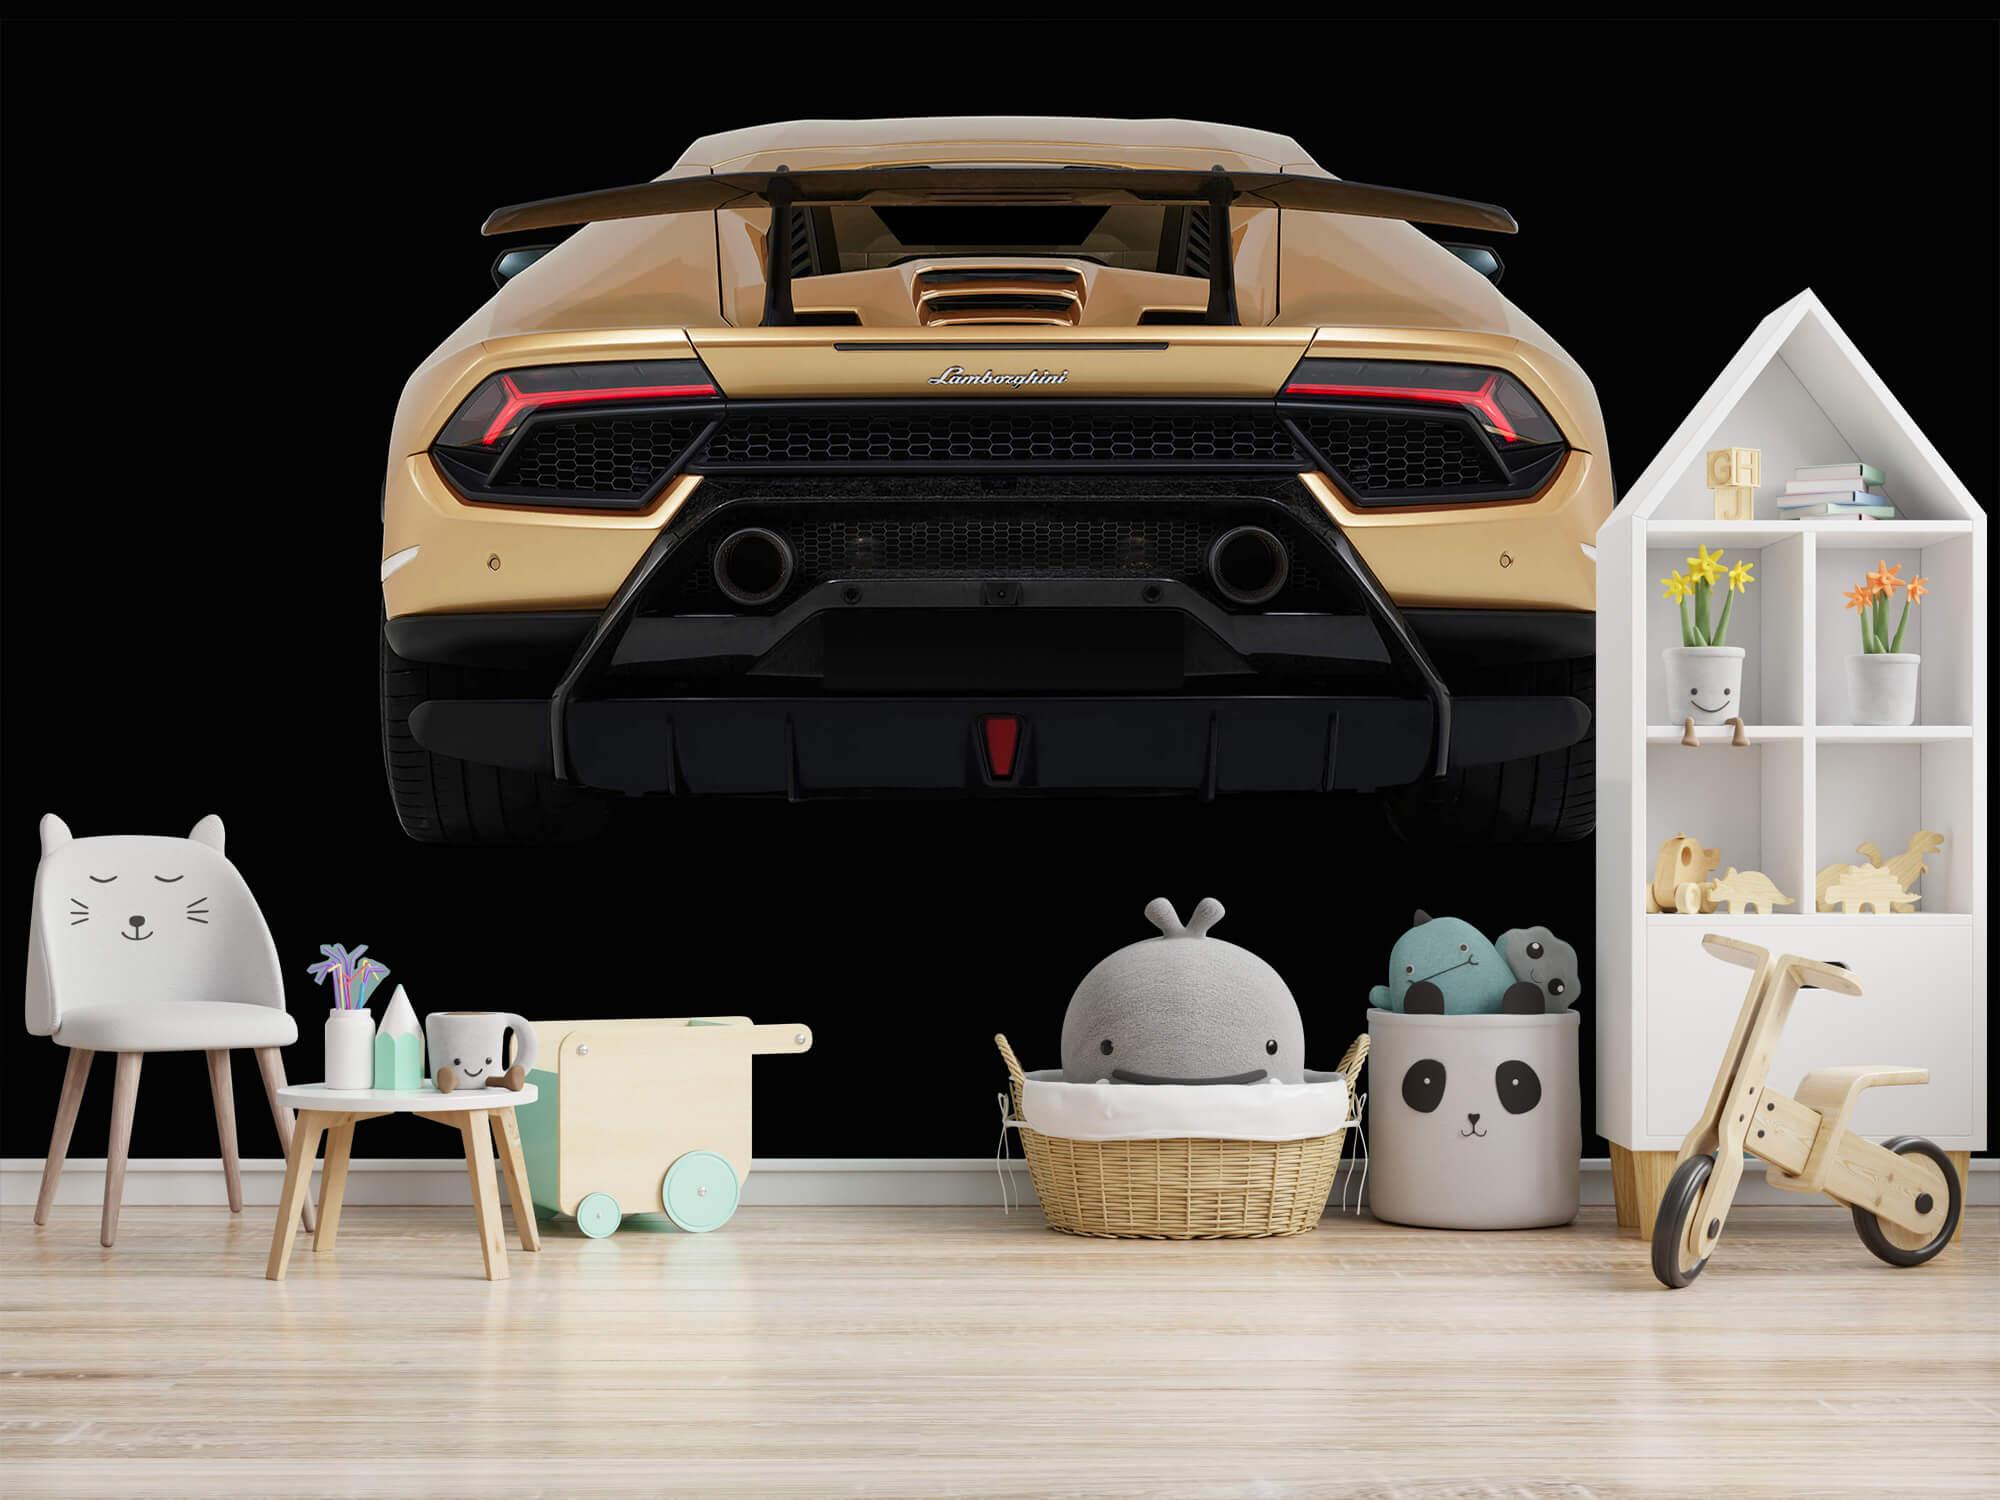 Wallpaper Lamborghini Huracán - Rear view, black 5